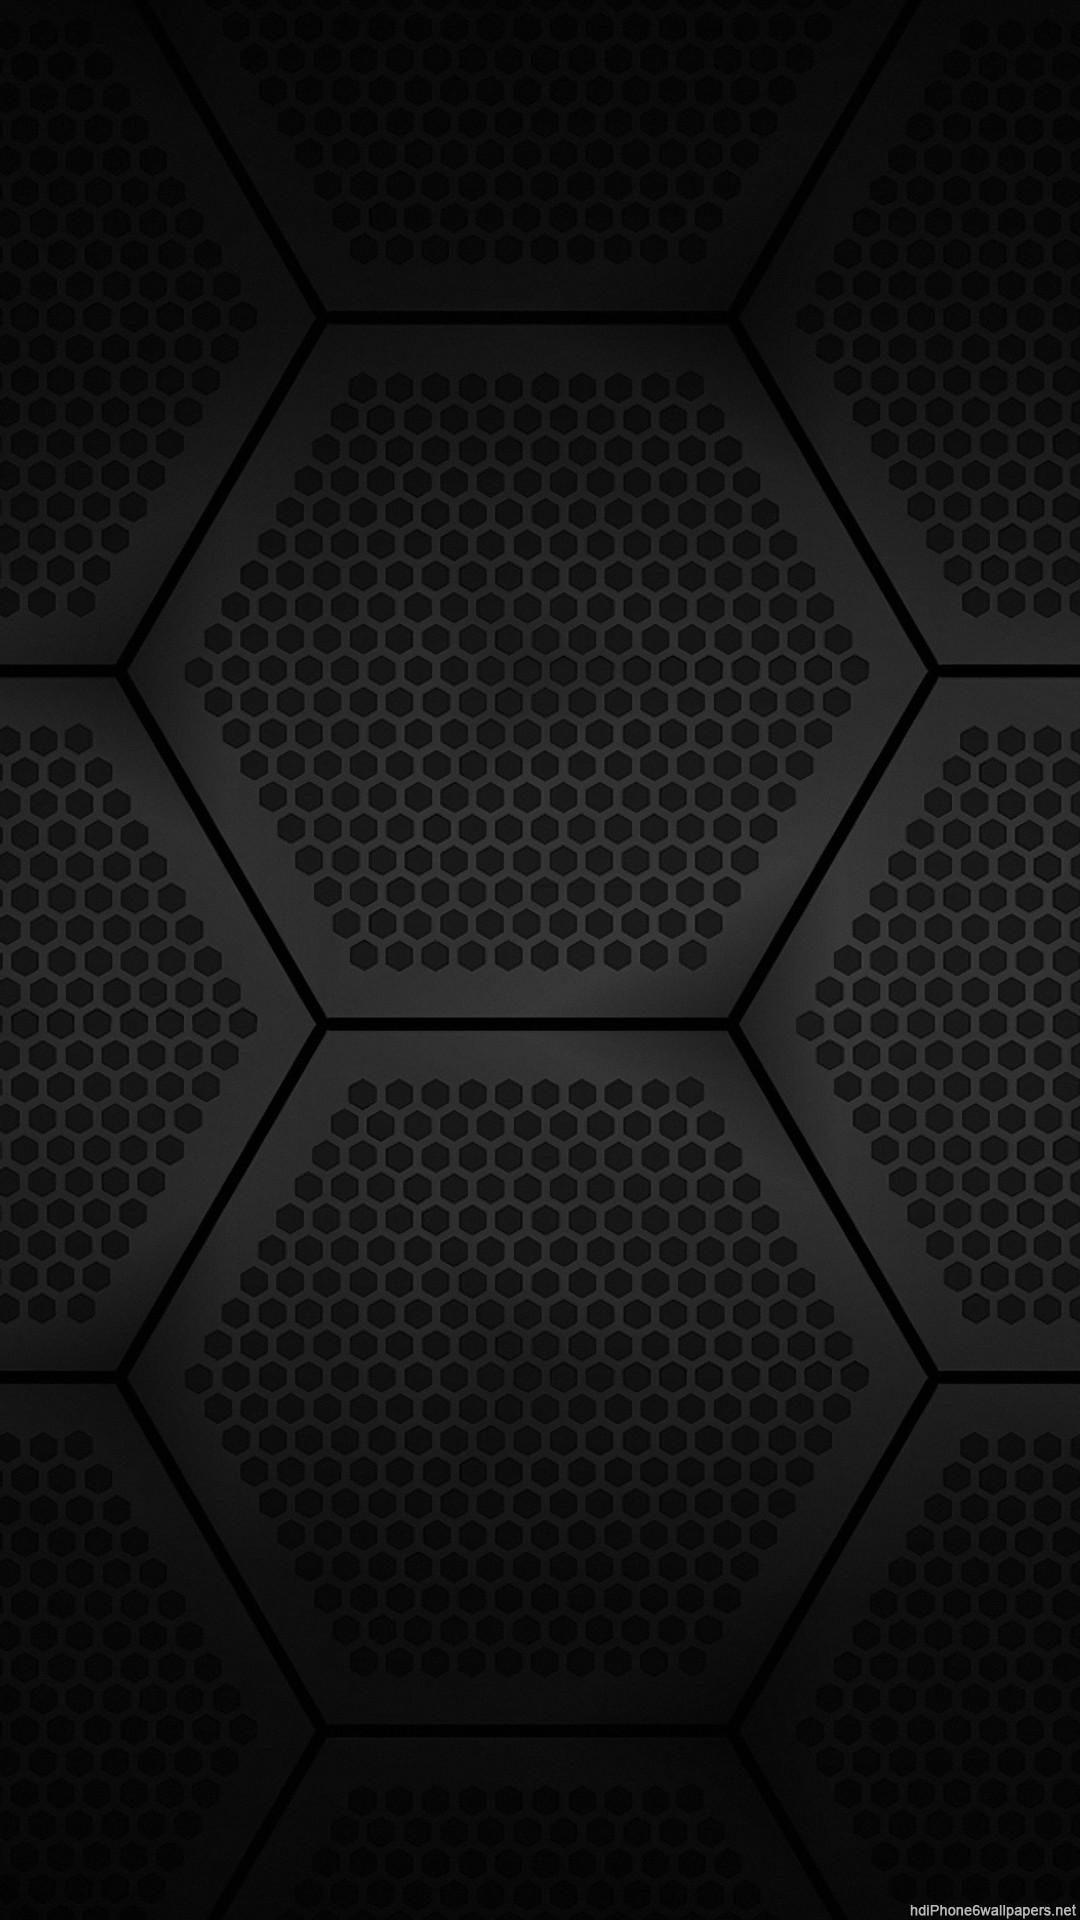 1080x1920 Hd Vertical Wallpaper 75 Images